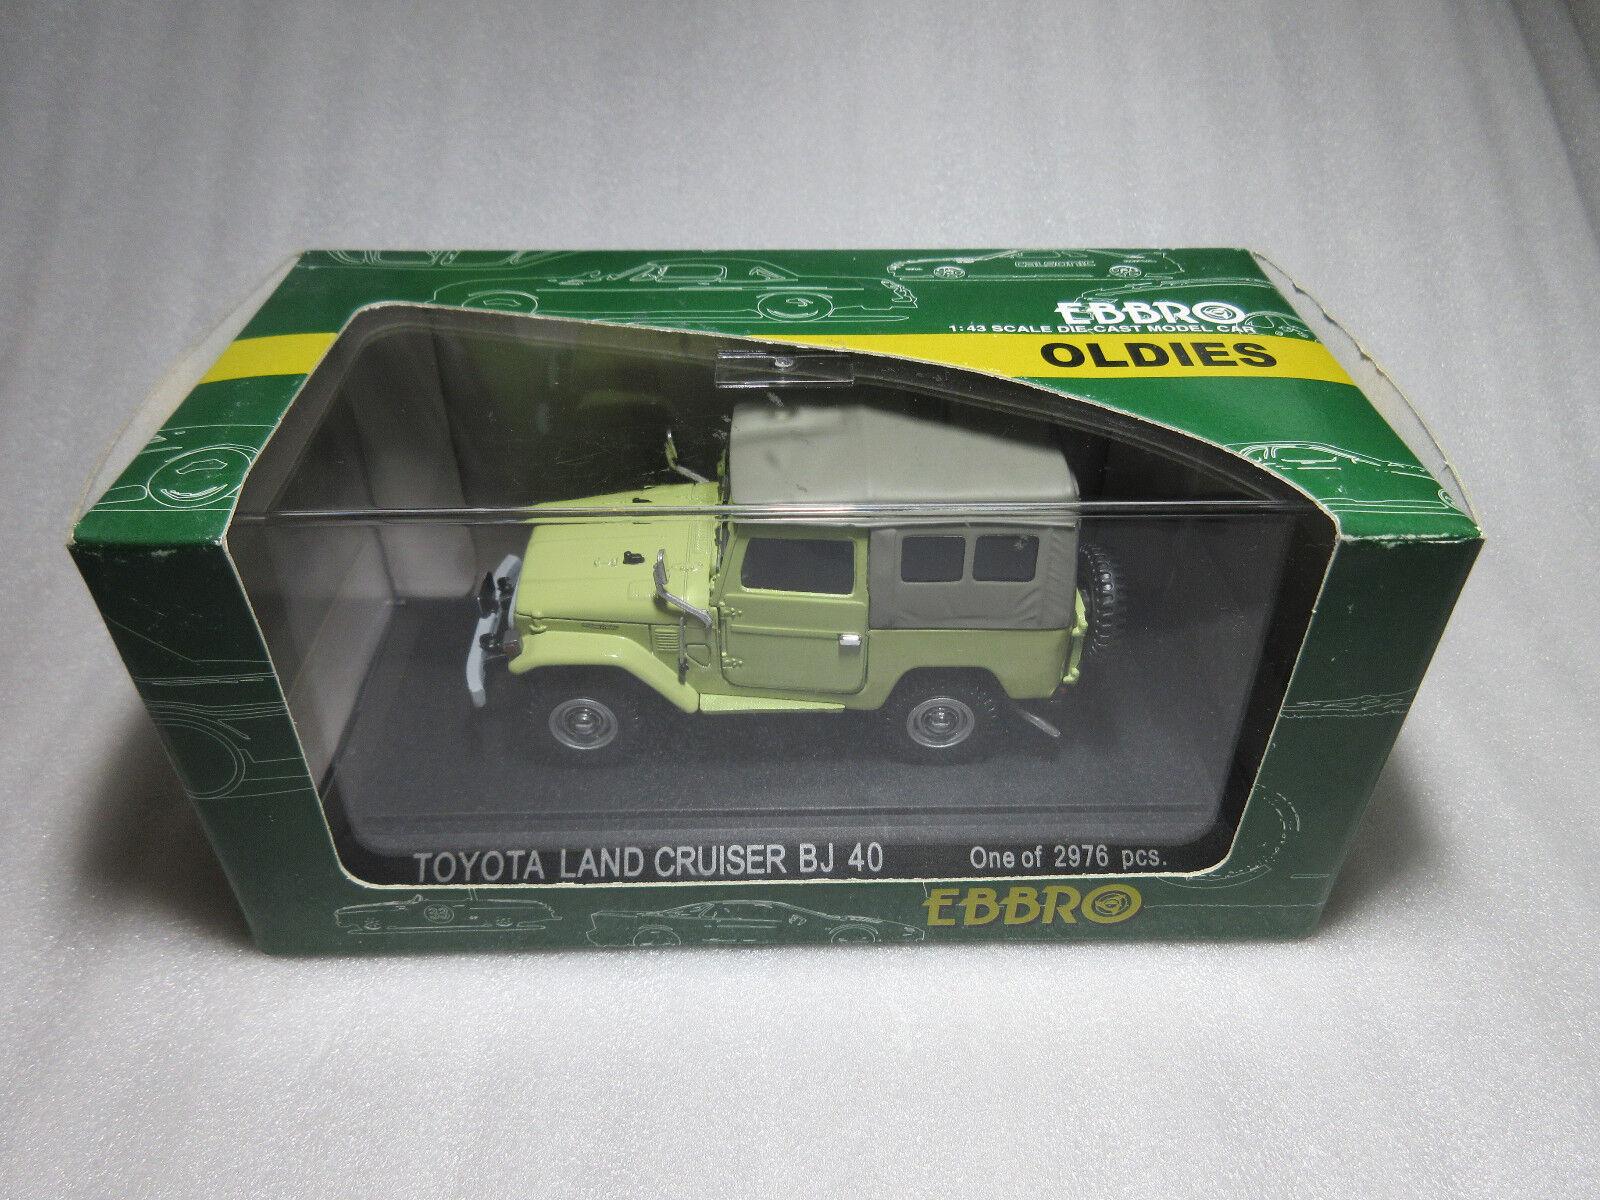 EBBRO SpielzeugOTA LAND CRUISER BJ40 Grün 1 43 DIECAST Modellll